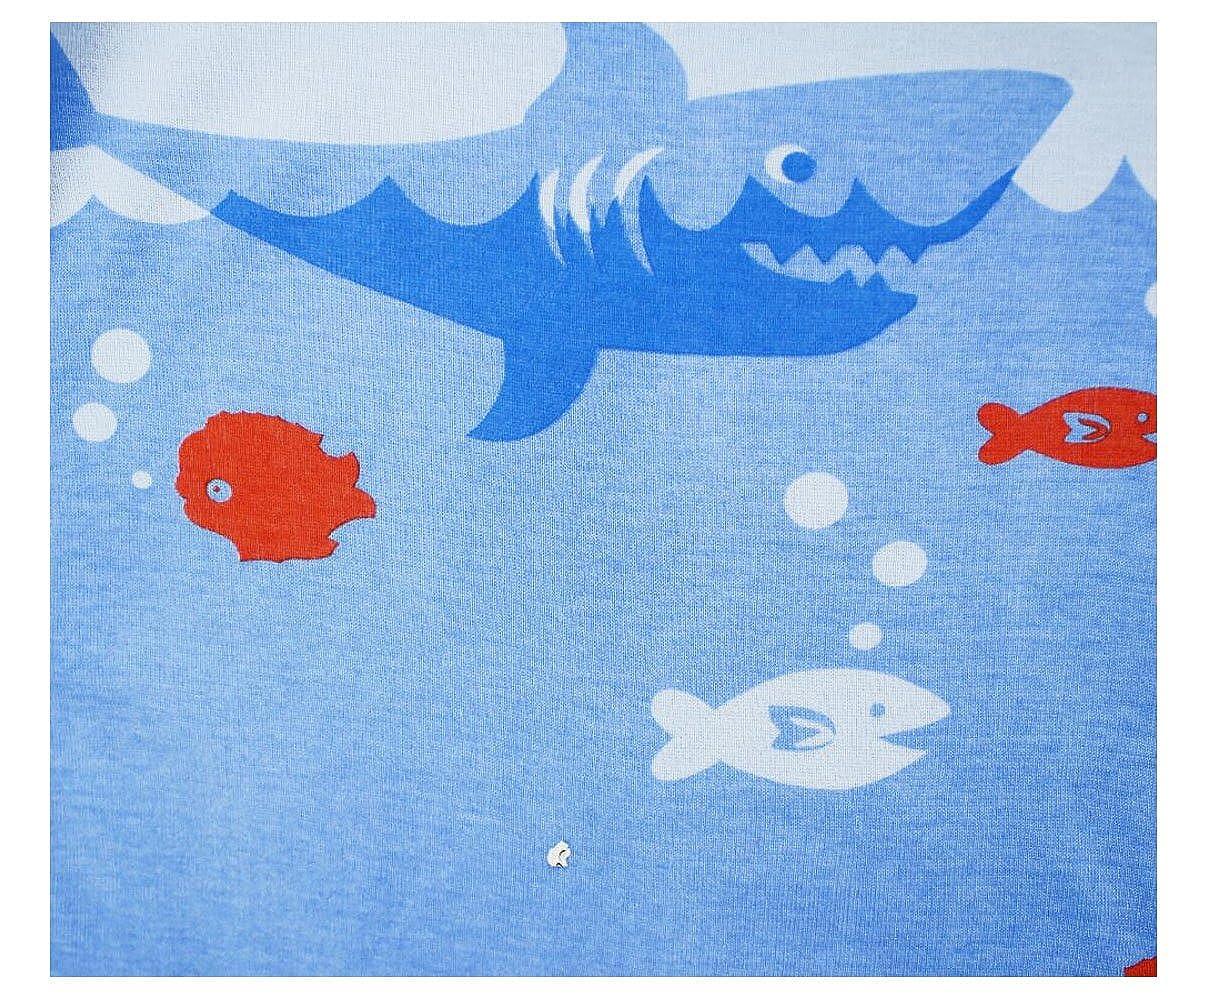 Gold treasure Little Kids Sleepwear Long Sleeve Pajama Set with Cartoon Ocean Shark-Hunting